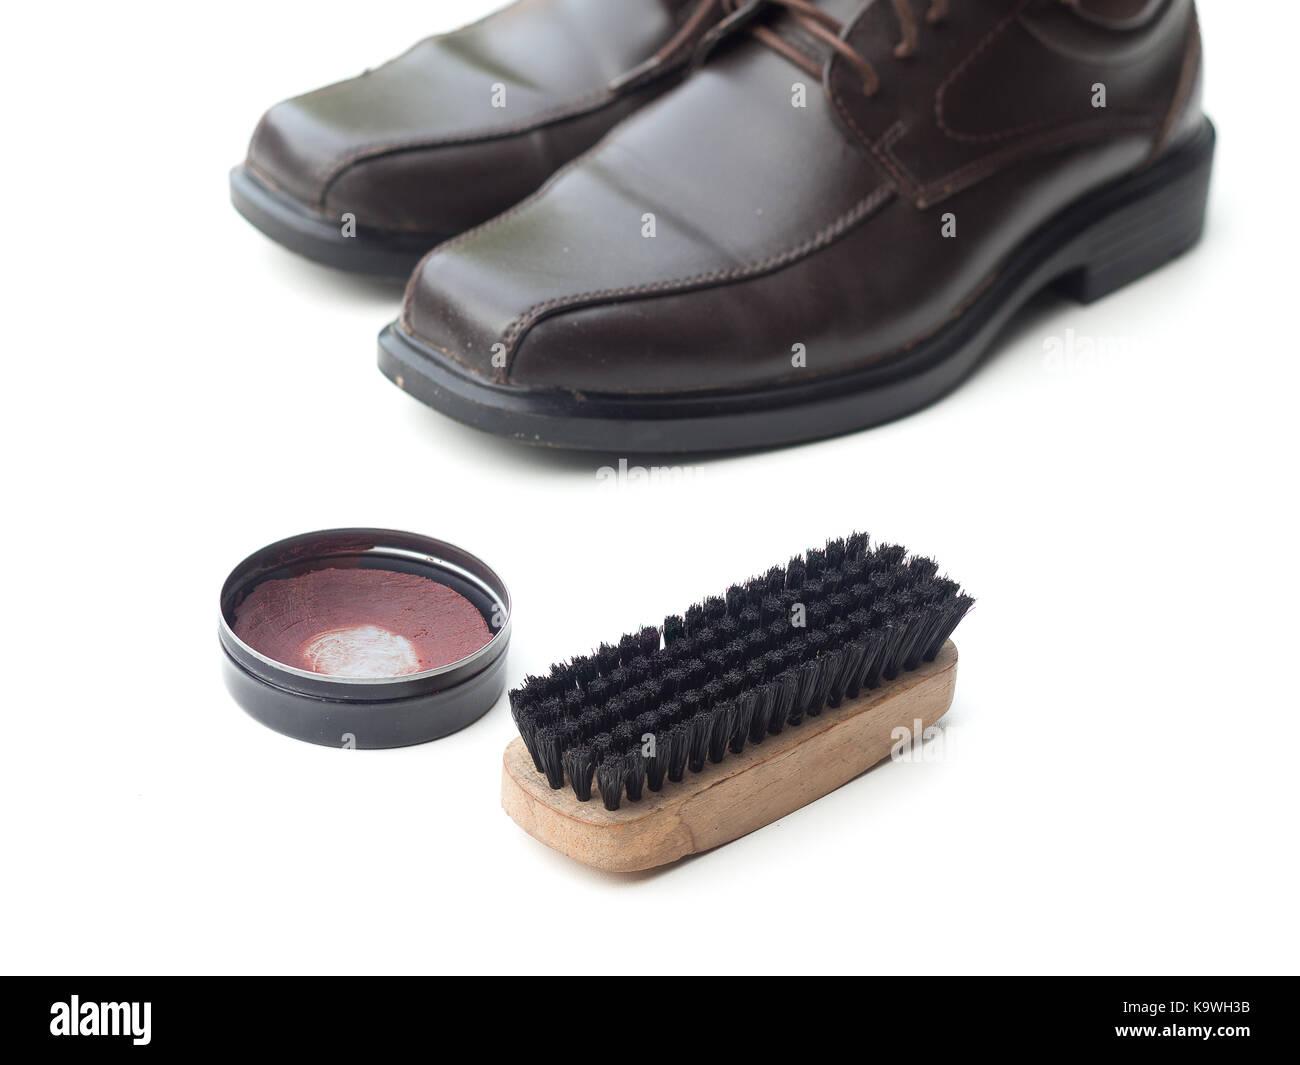 Dark brown shoe with shoe polish and brush shoe isolated on white background - Stock Image